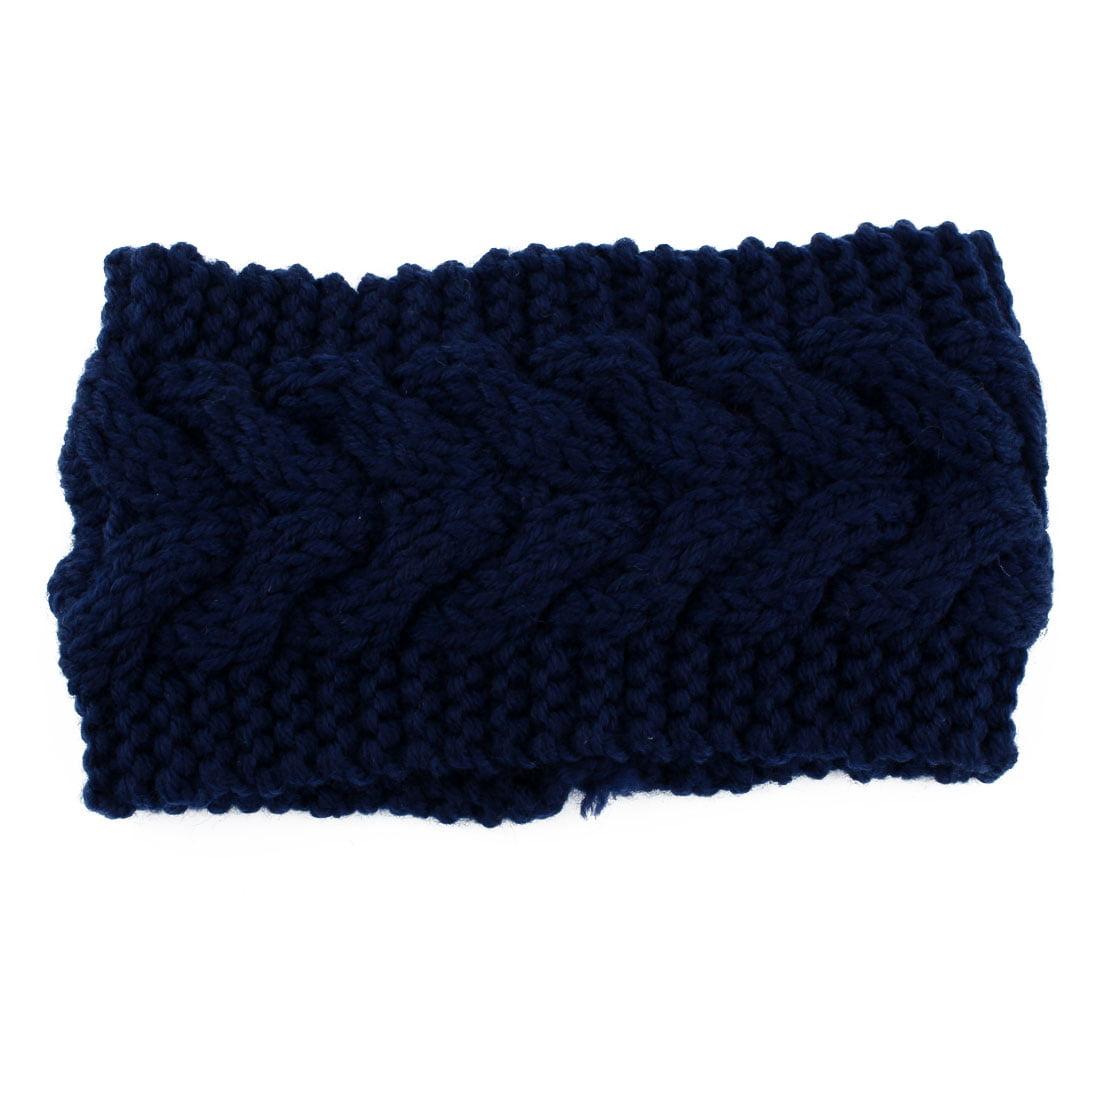 Twist Braided knitted Head Wrap Hair Band Sports Ski Headband